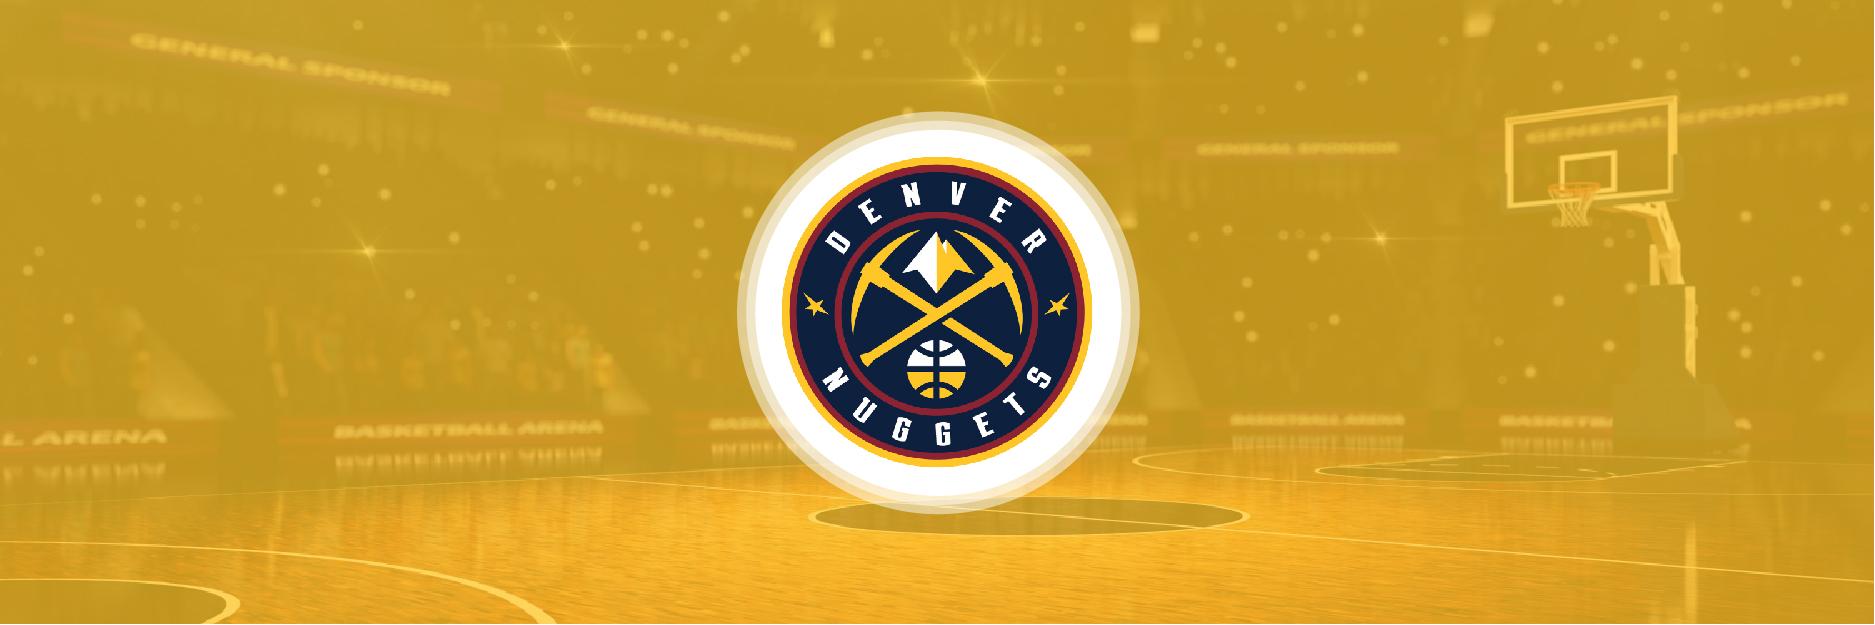 NBA Denver Nuggets 2020 Season Analysis